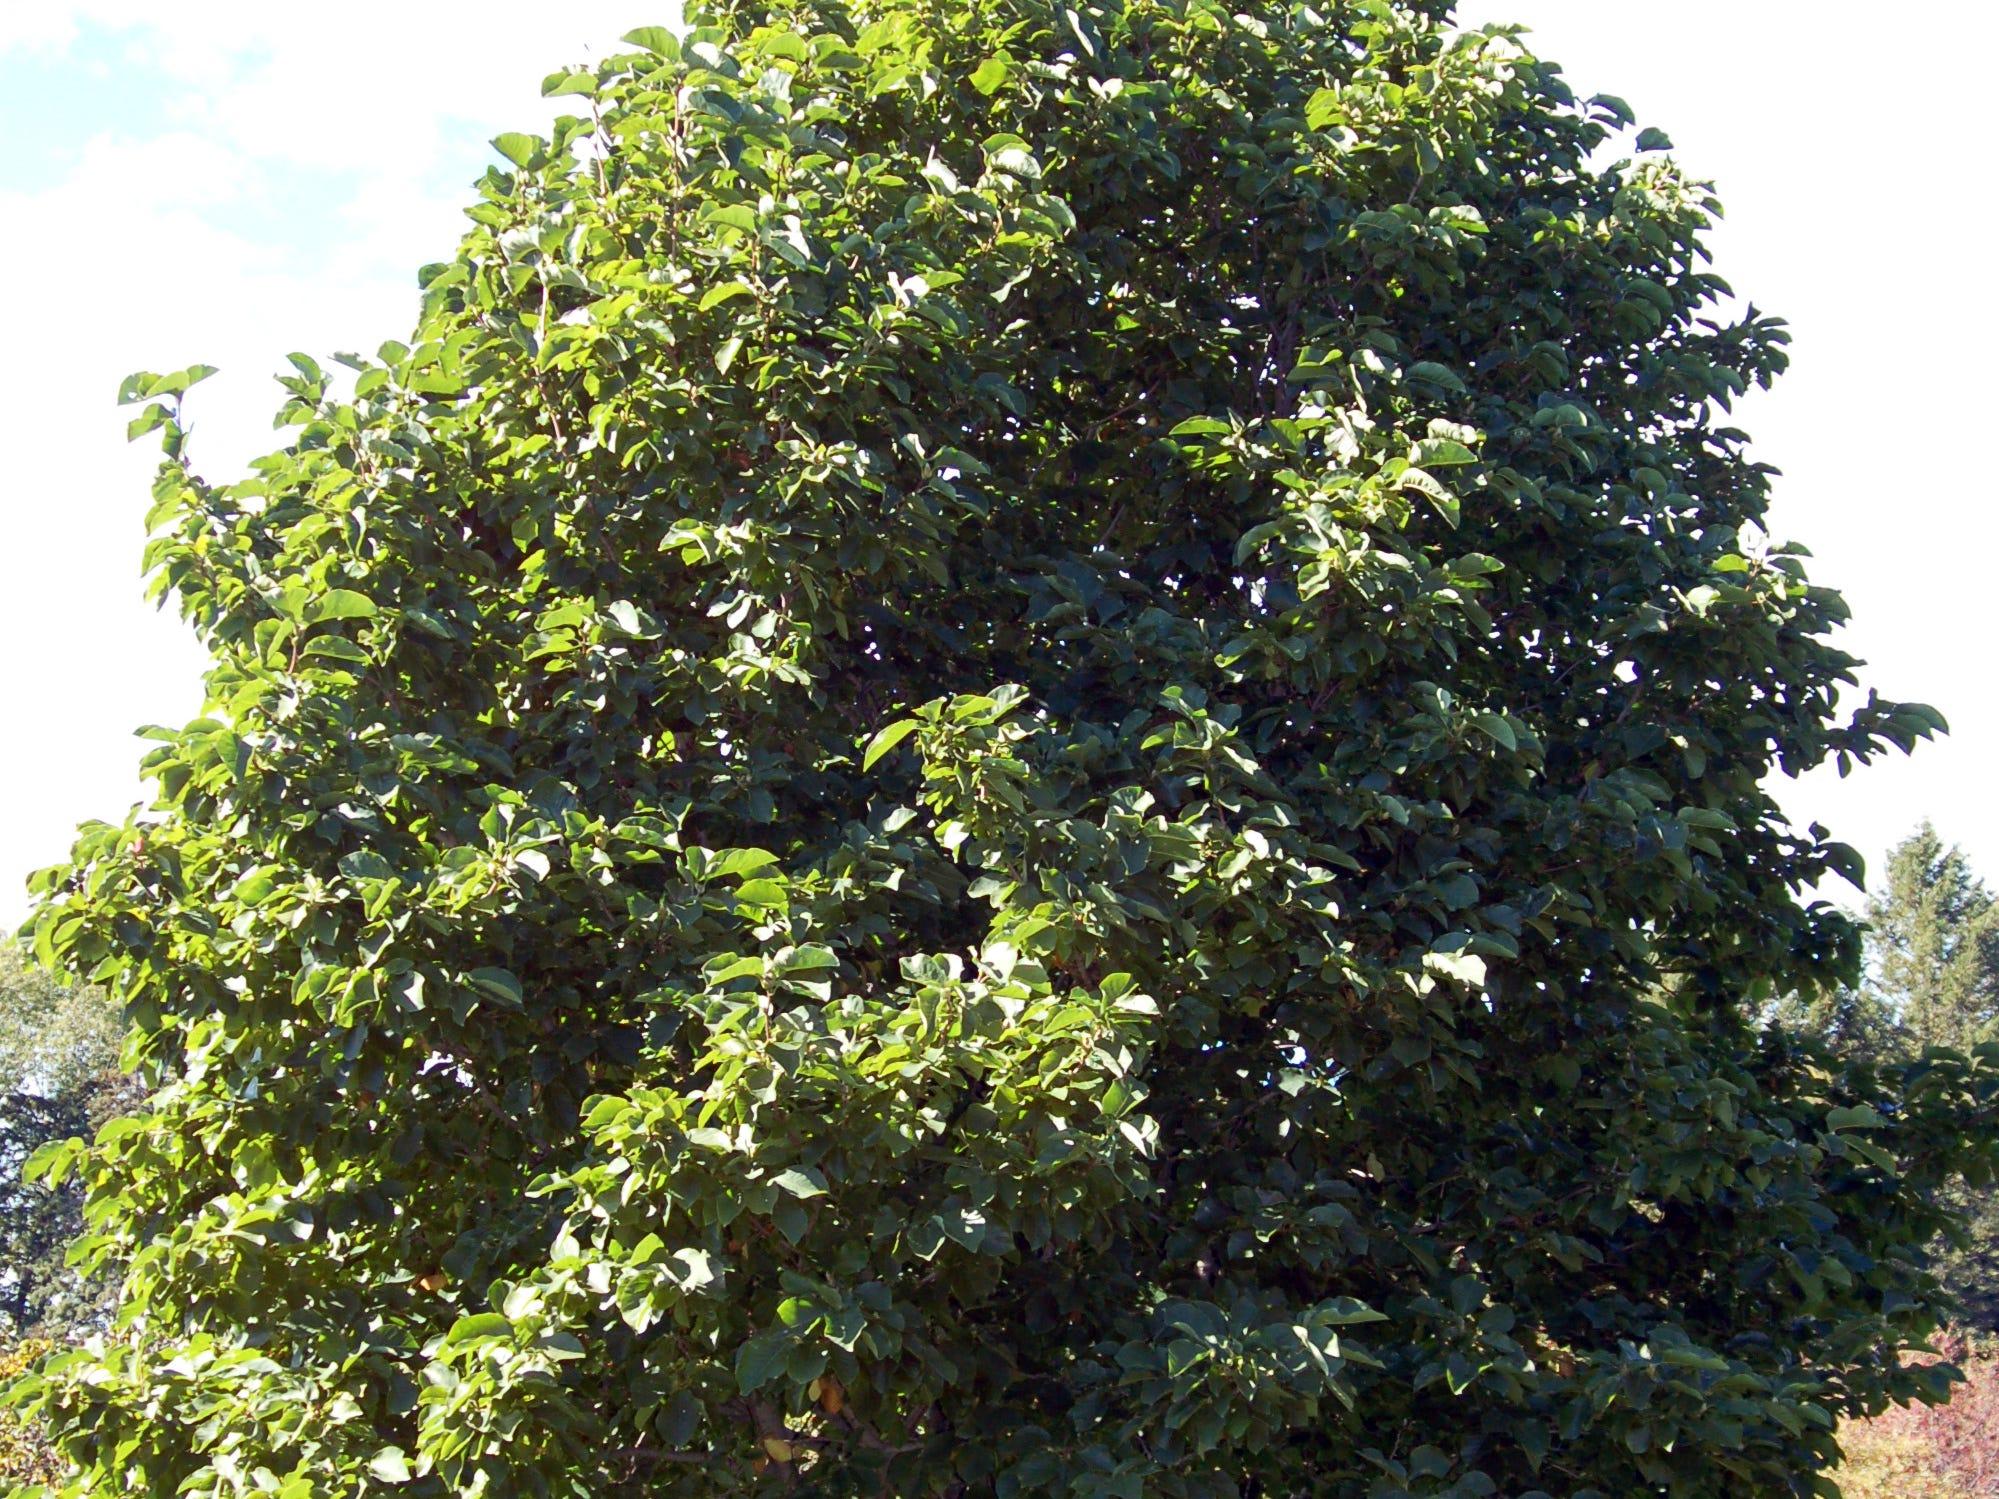 The Elizabeth magnolia grows in a pyramidal shape to 30 feet tall.